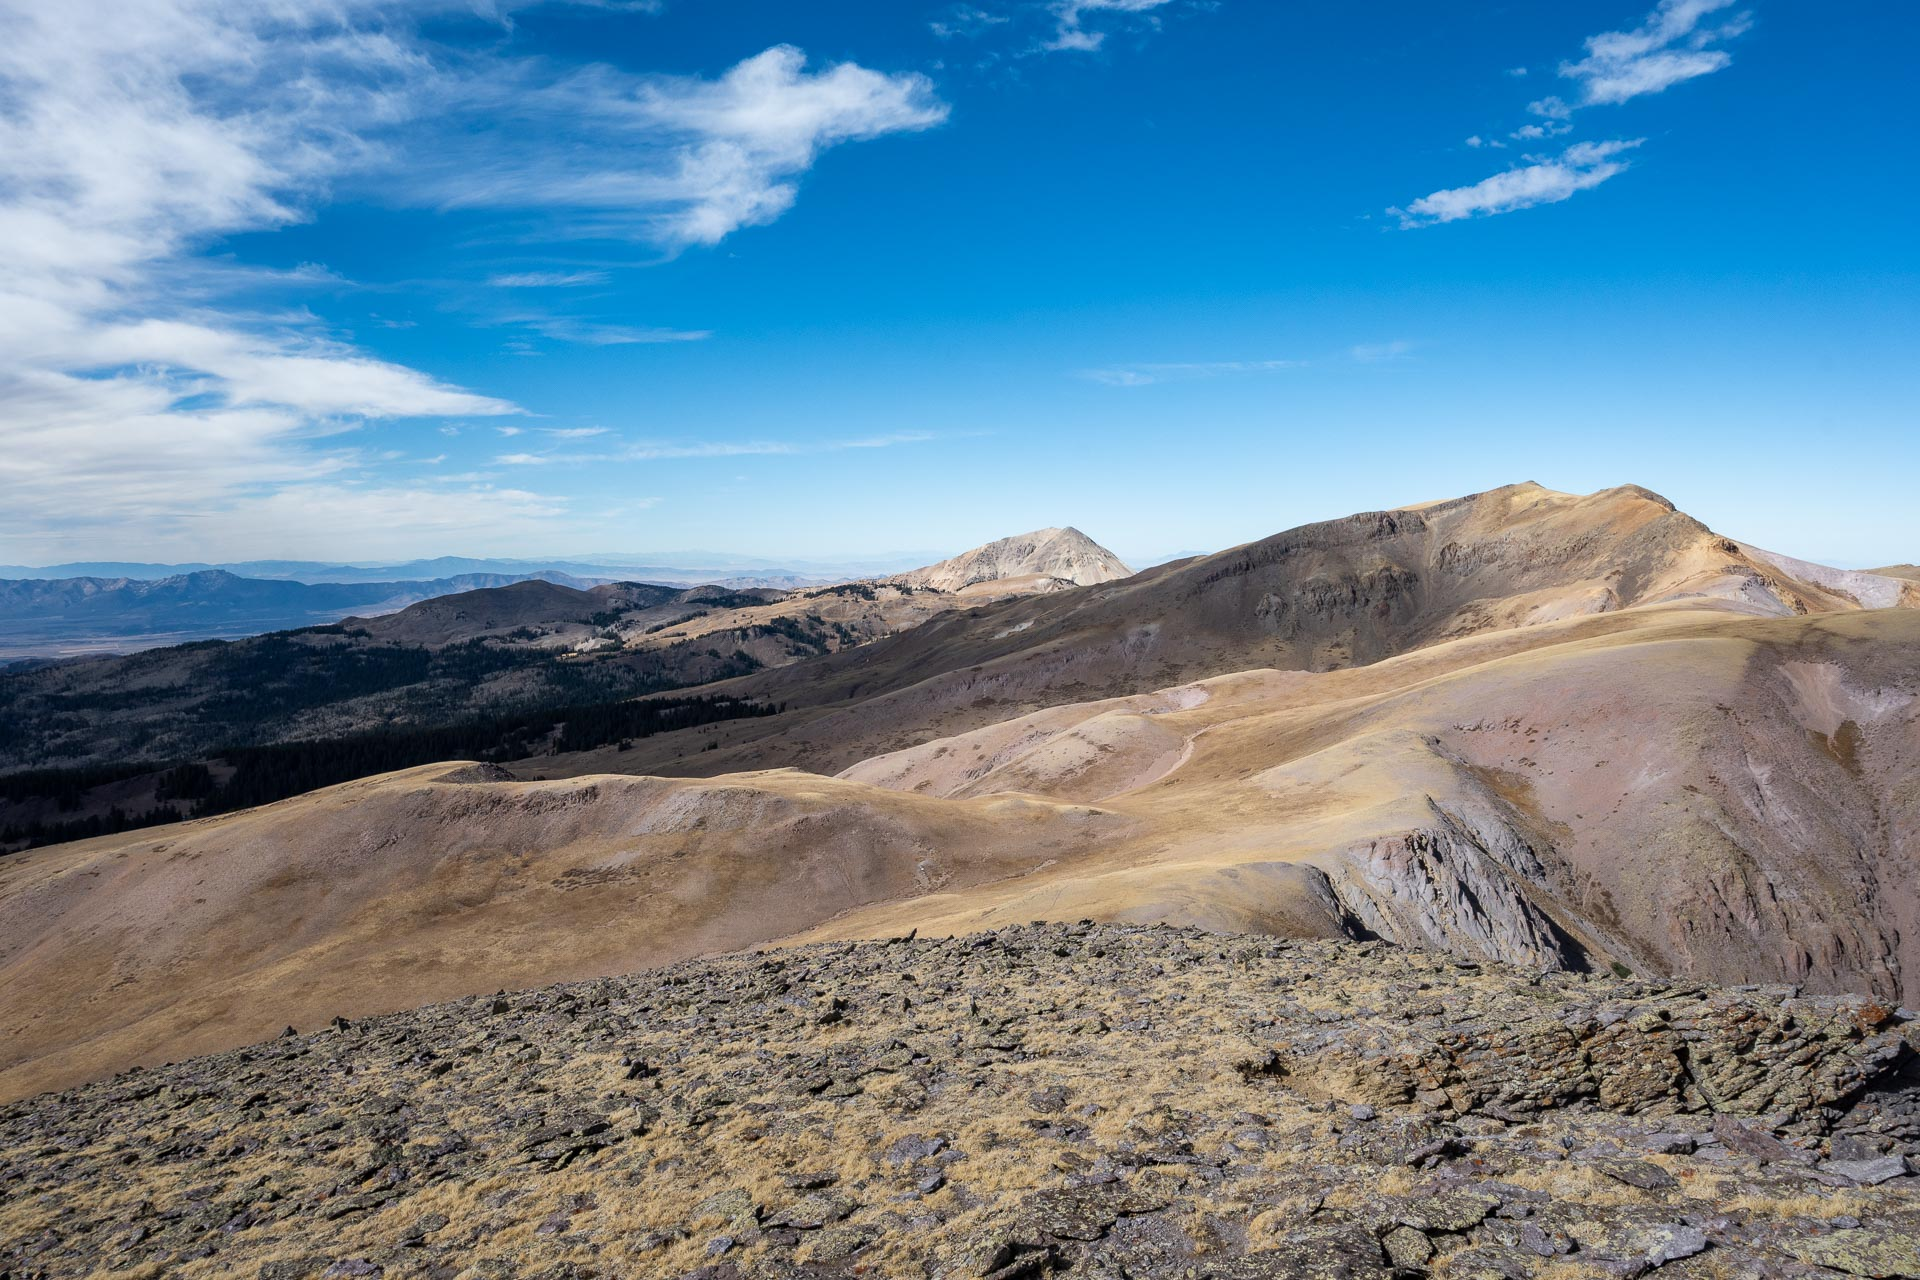 Mt. Delano & Mt. Baldy